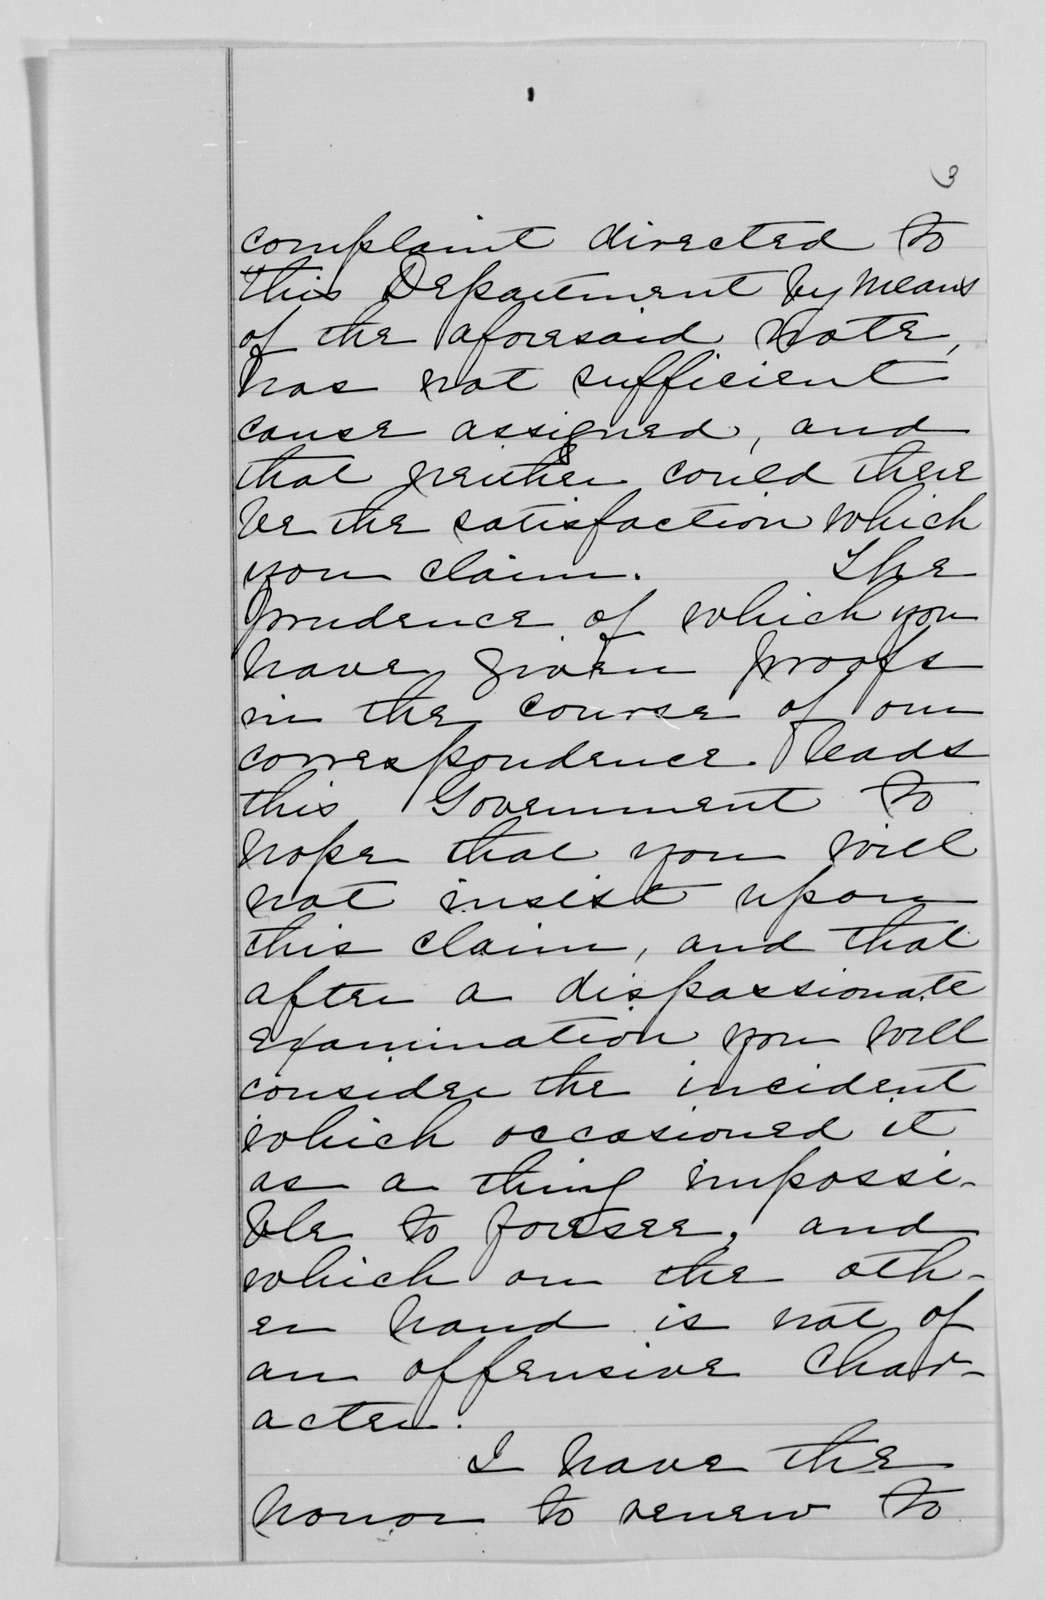 Confederate States of America records: Microfilm Reel 9